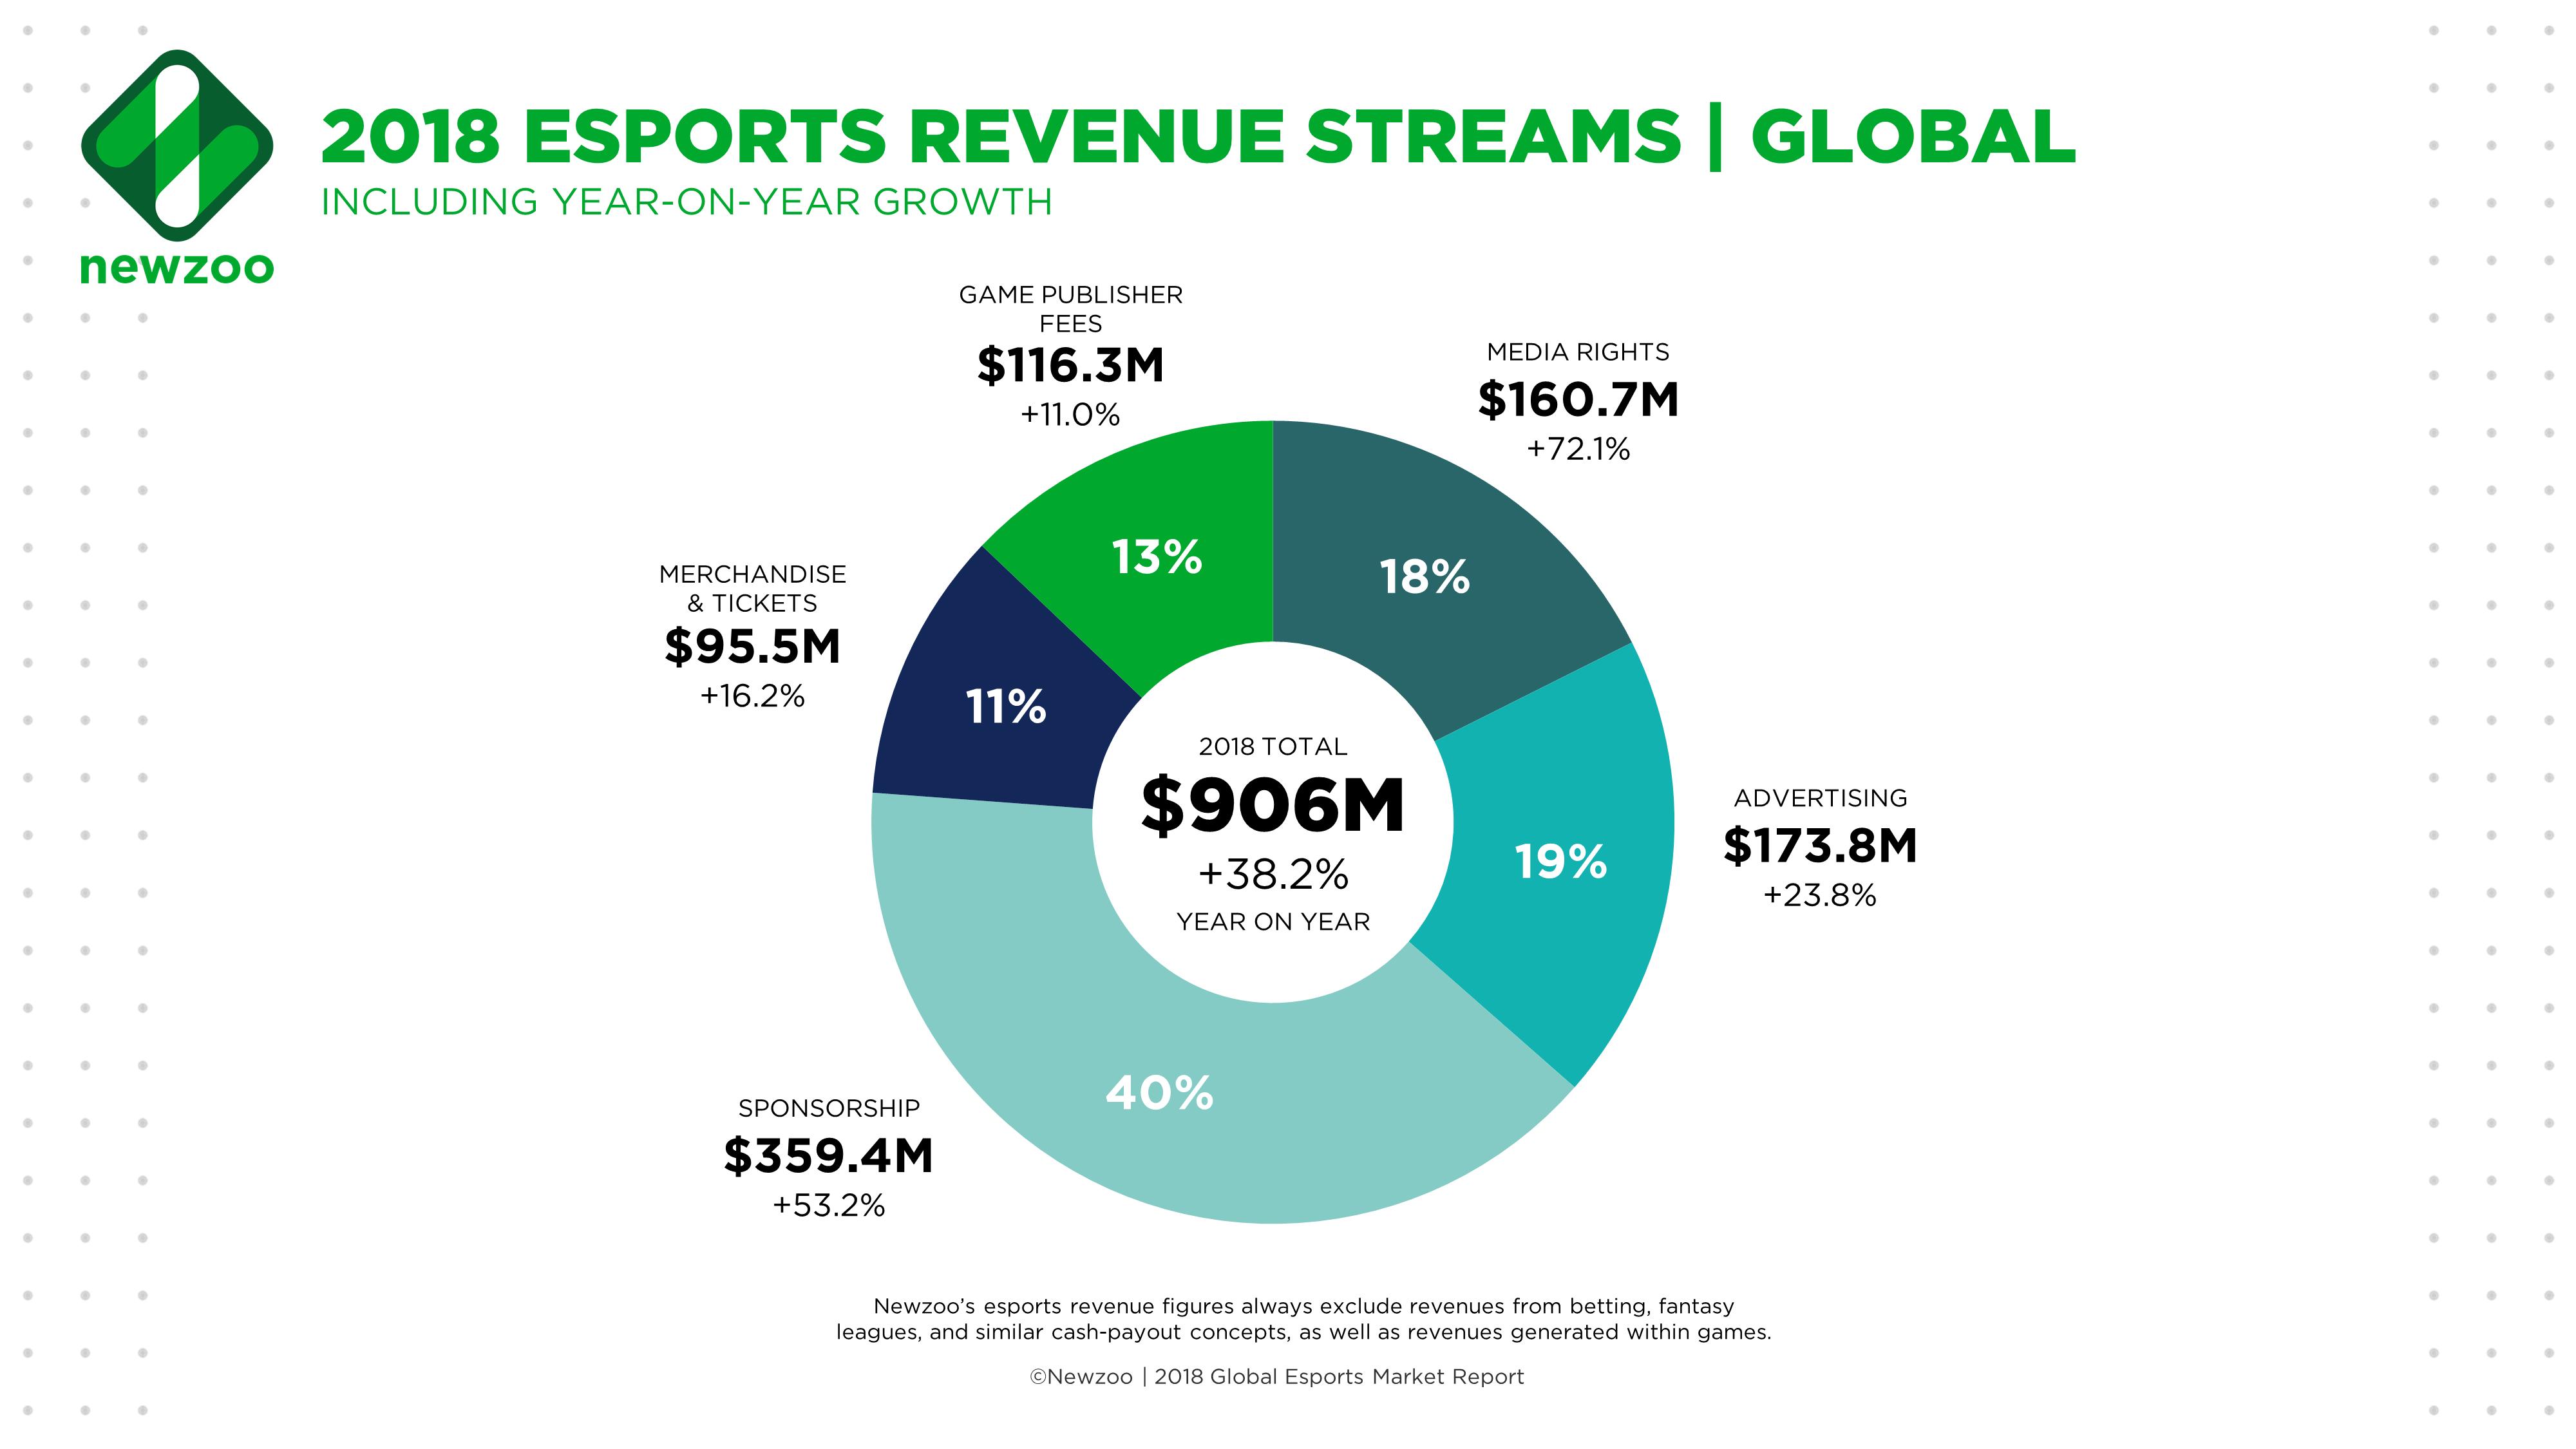 Newzoo_Esports_Revenue_Streams_Global